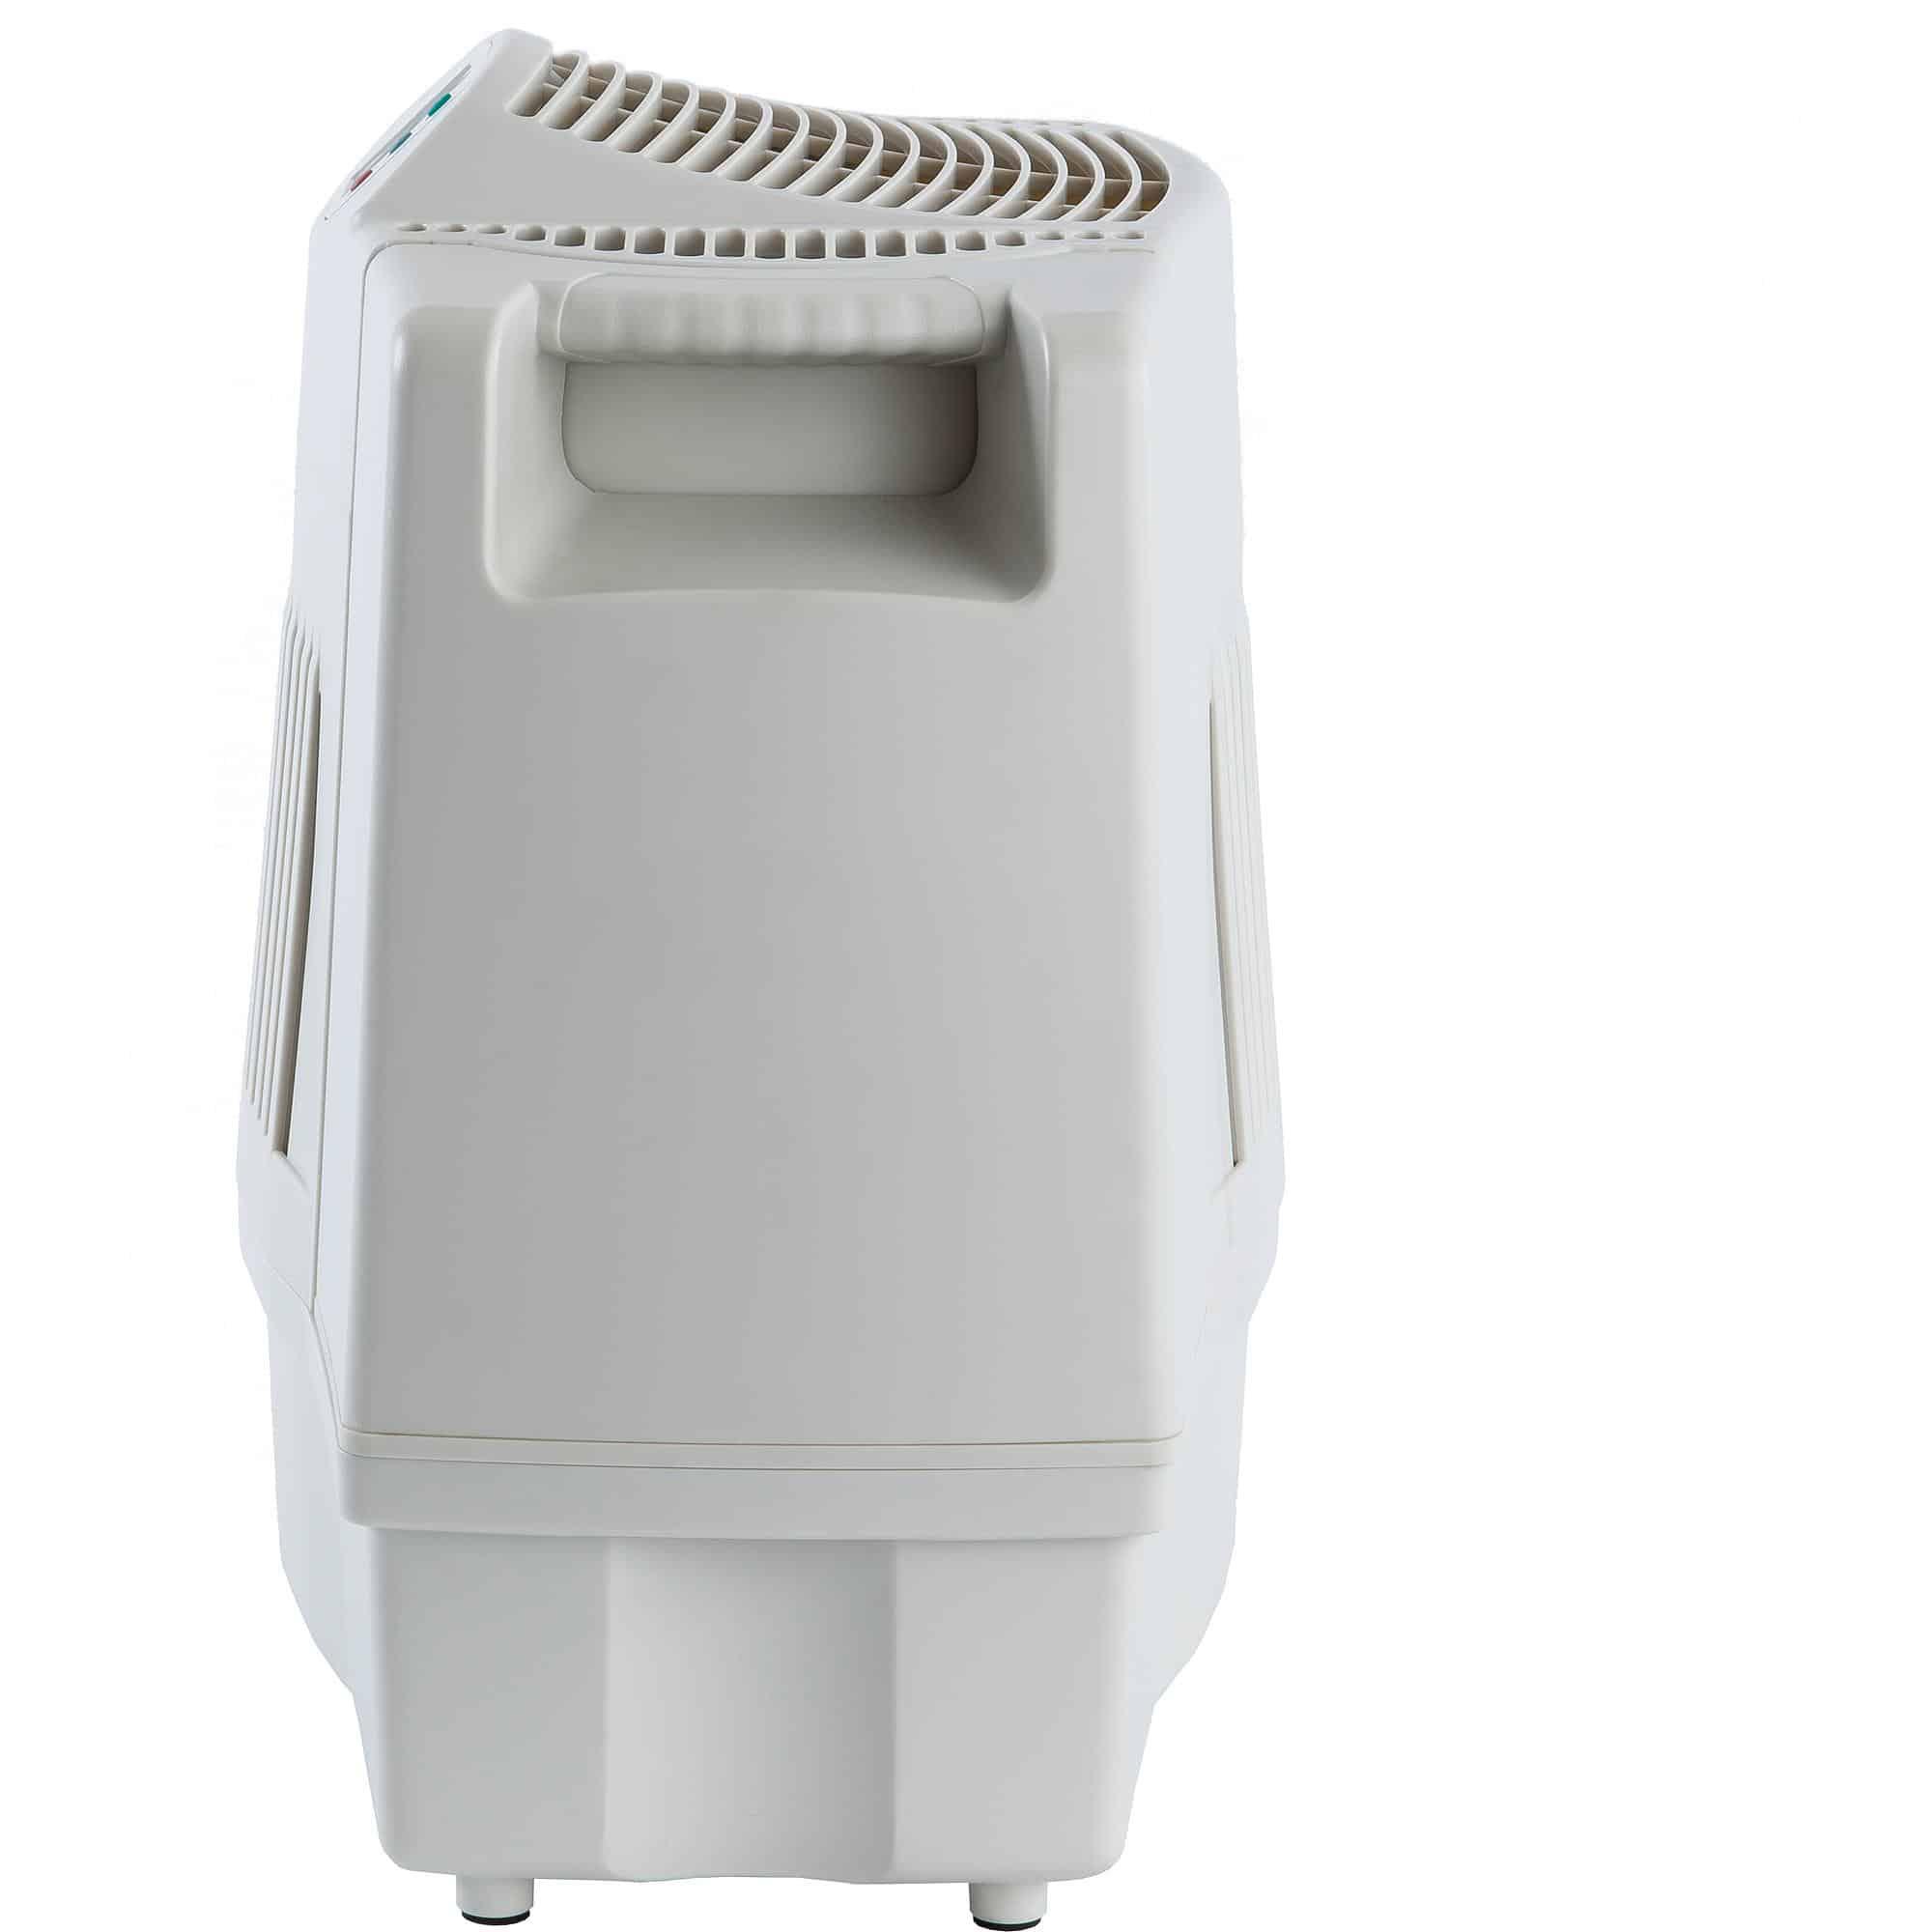 AIRCARE MA0800 Digital Whole-House Console-Style Evaporative Humidifier